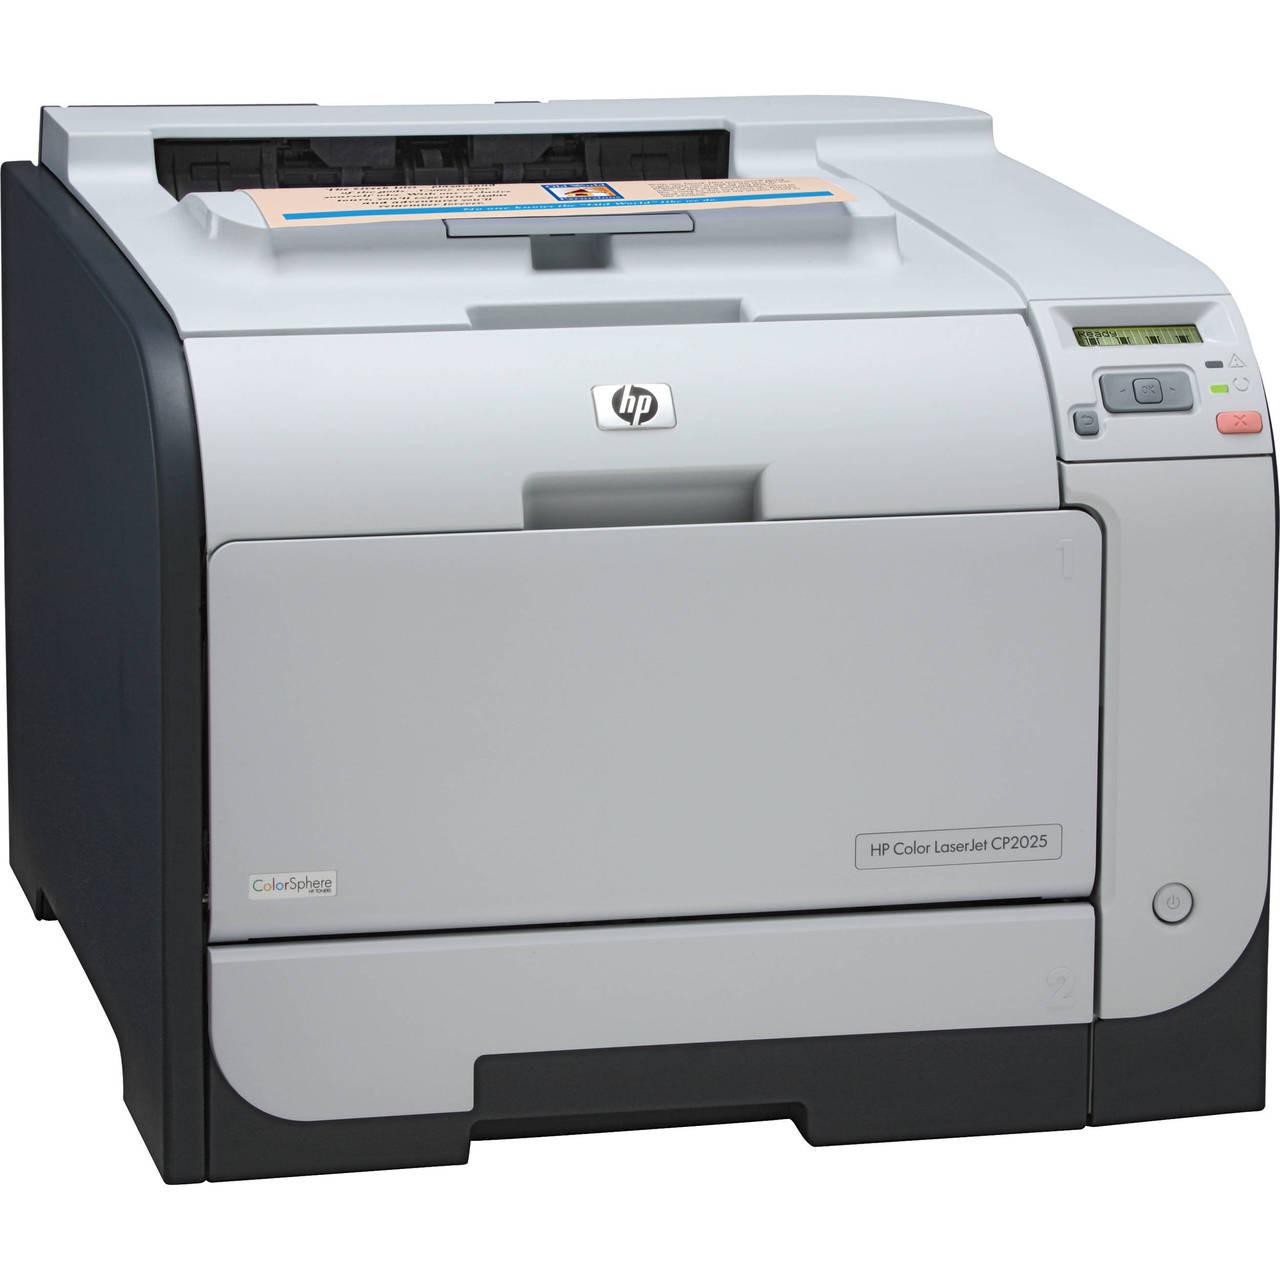 HP Color LaserJet CP2025dn Printer - CB495A - HP Laser Printer for sale